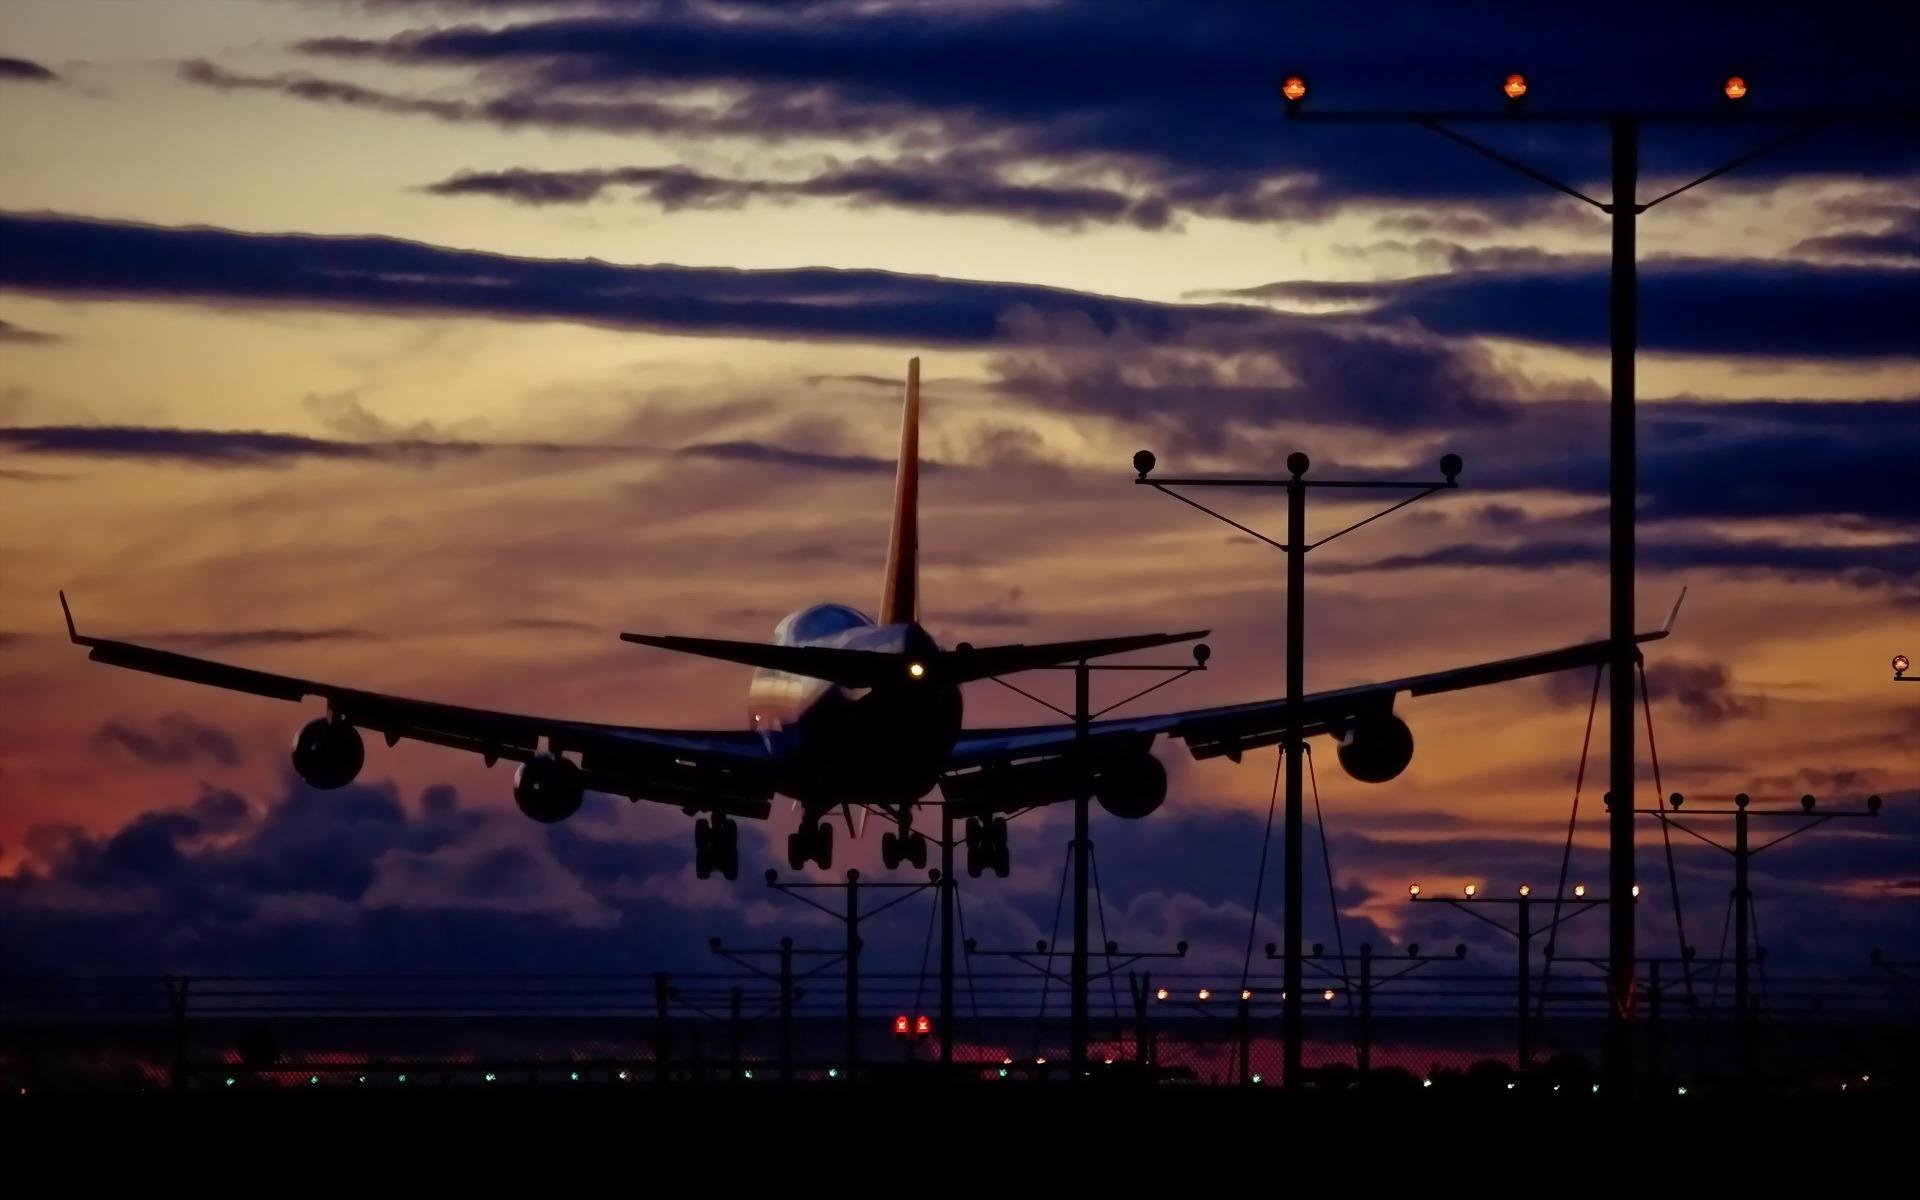 самолет полет закат бесплатно